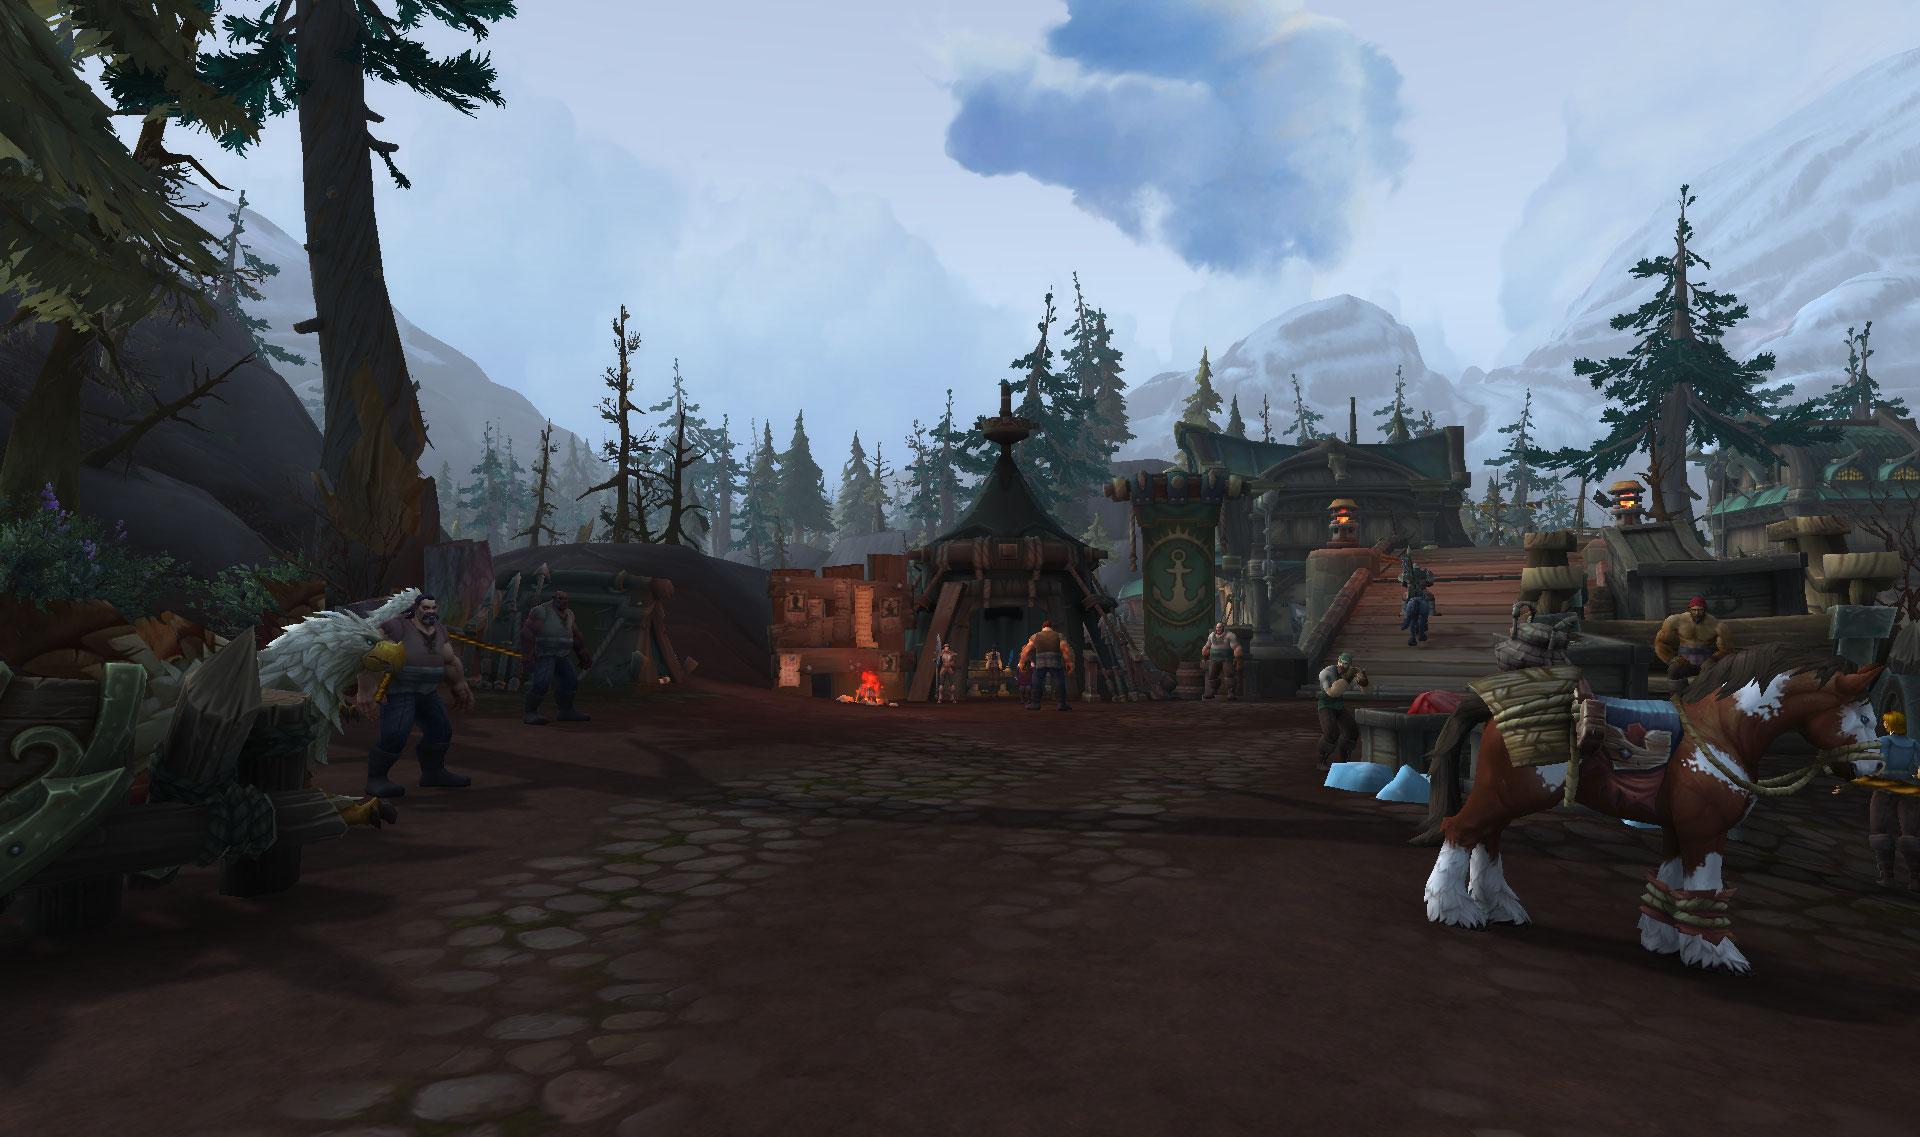 Screenshot de la zone Rade de Tiragarde de World of Warcraft: Battle for Azeroth.